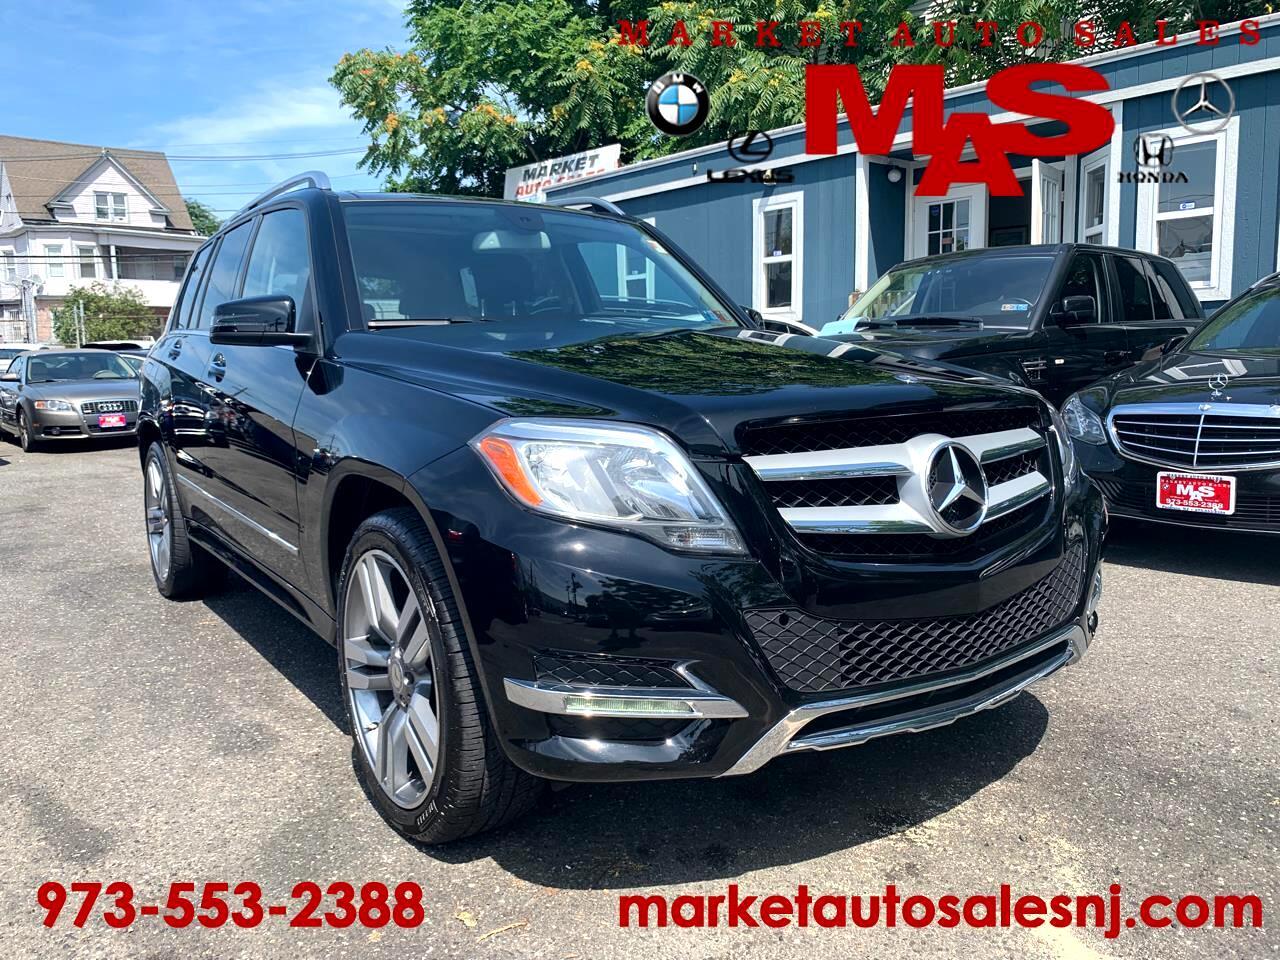 Used Cars for Sale Paterson NJ 07513 Market Auto Sales